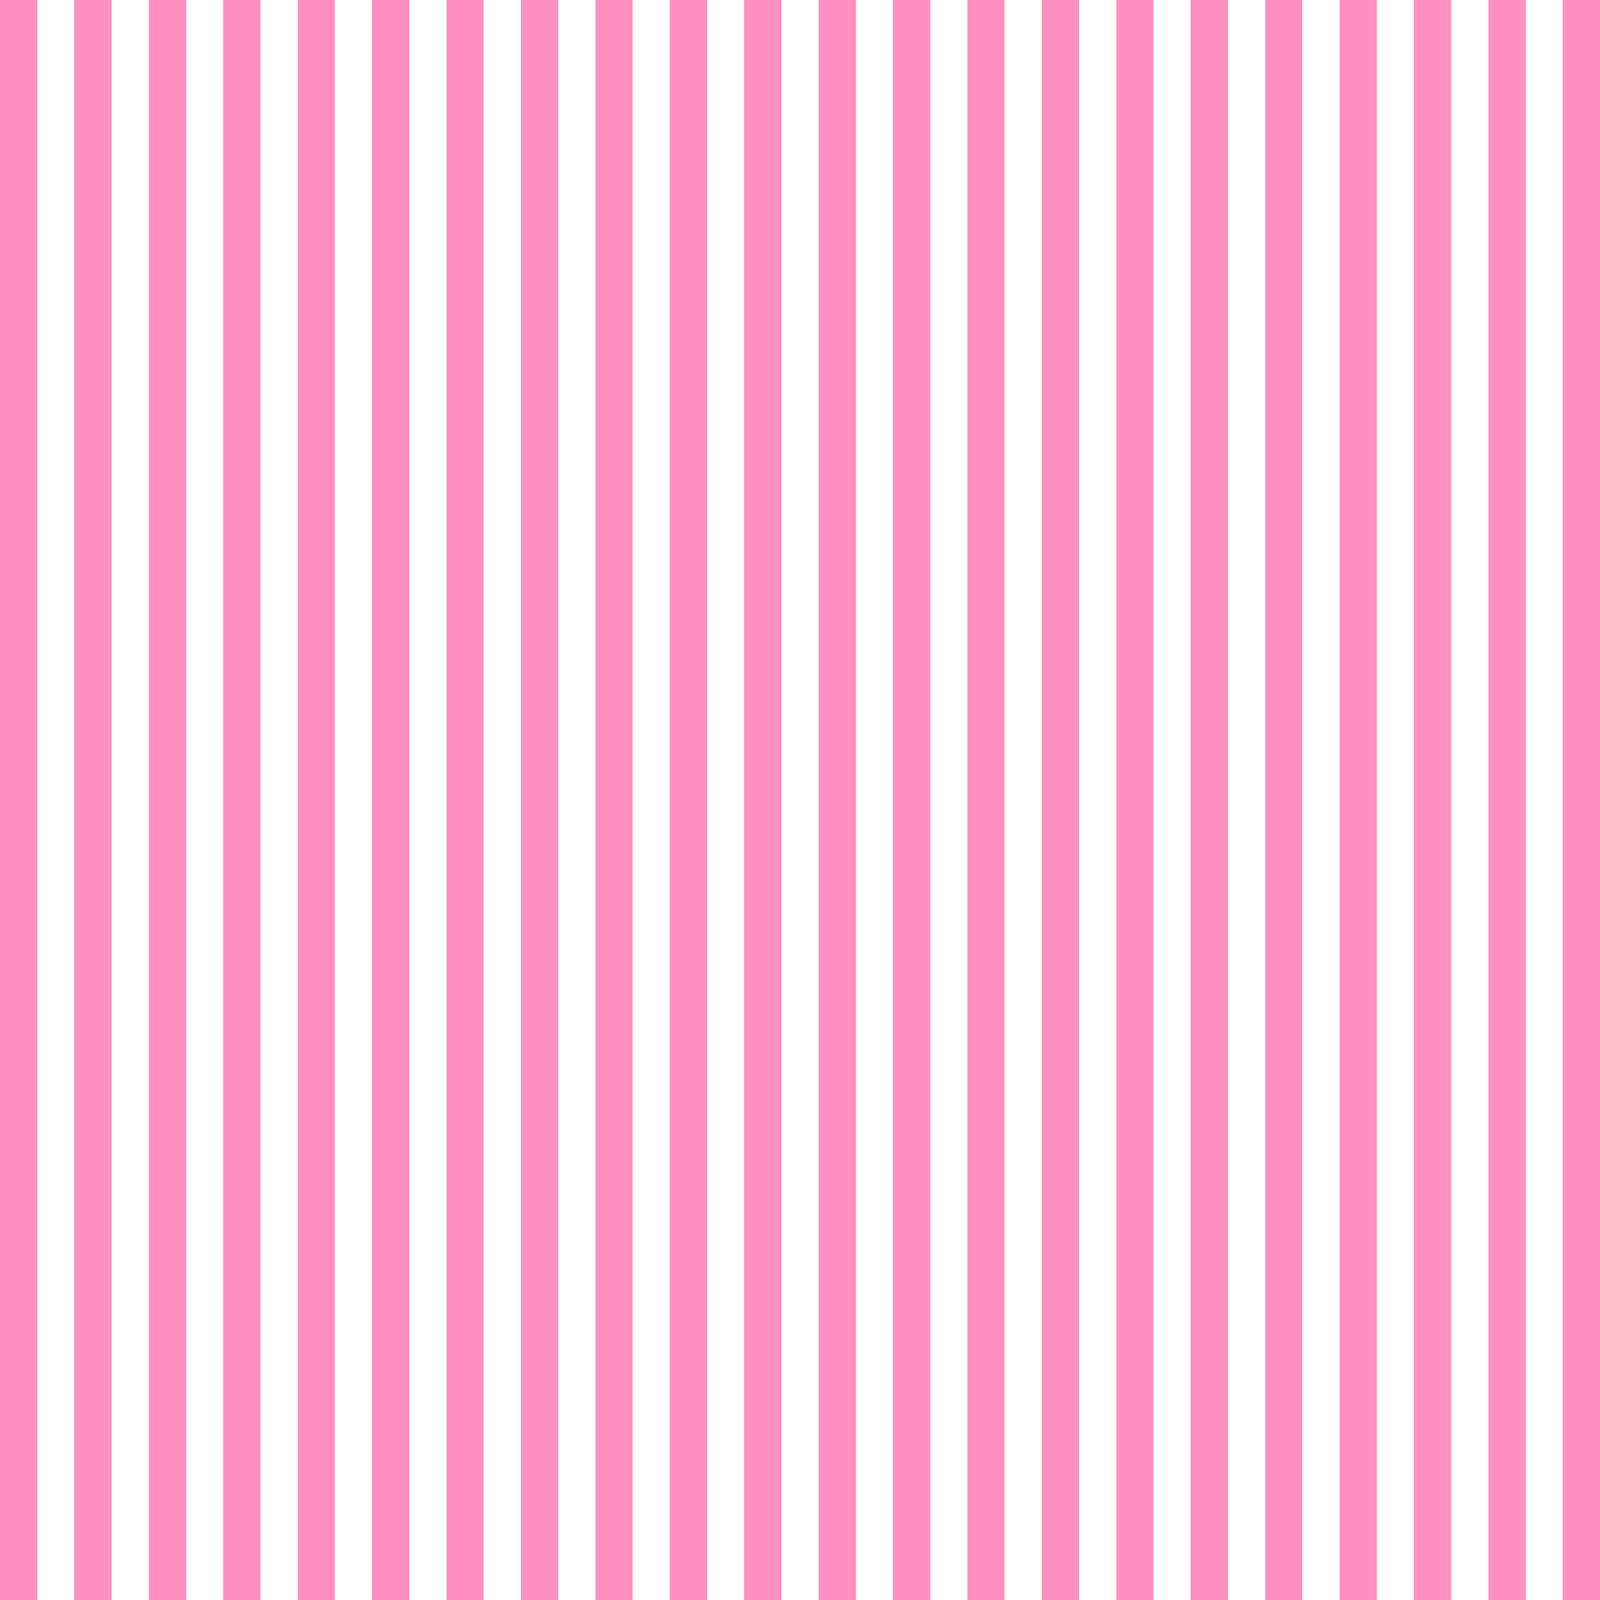 Pink pattern stripes - photo#8